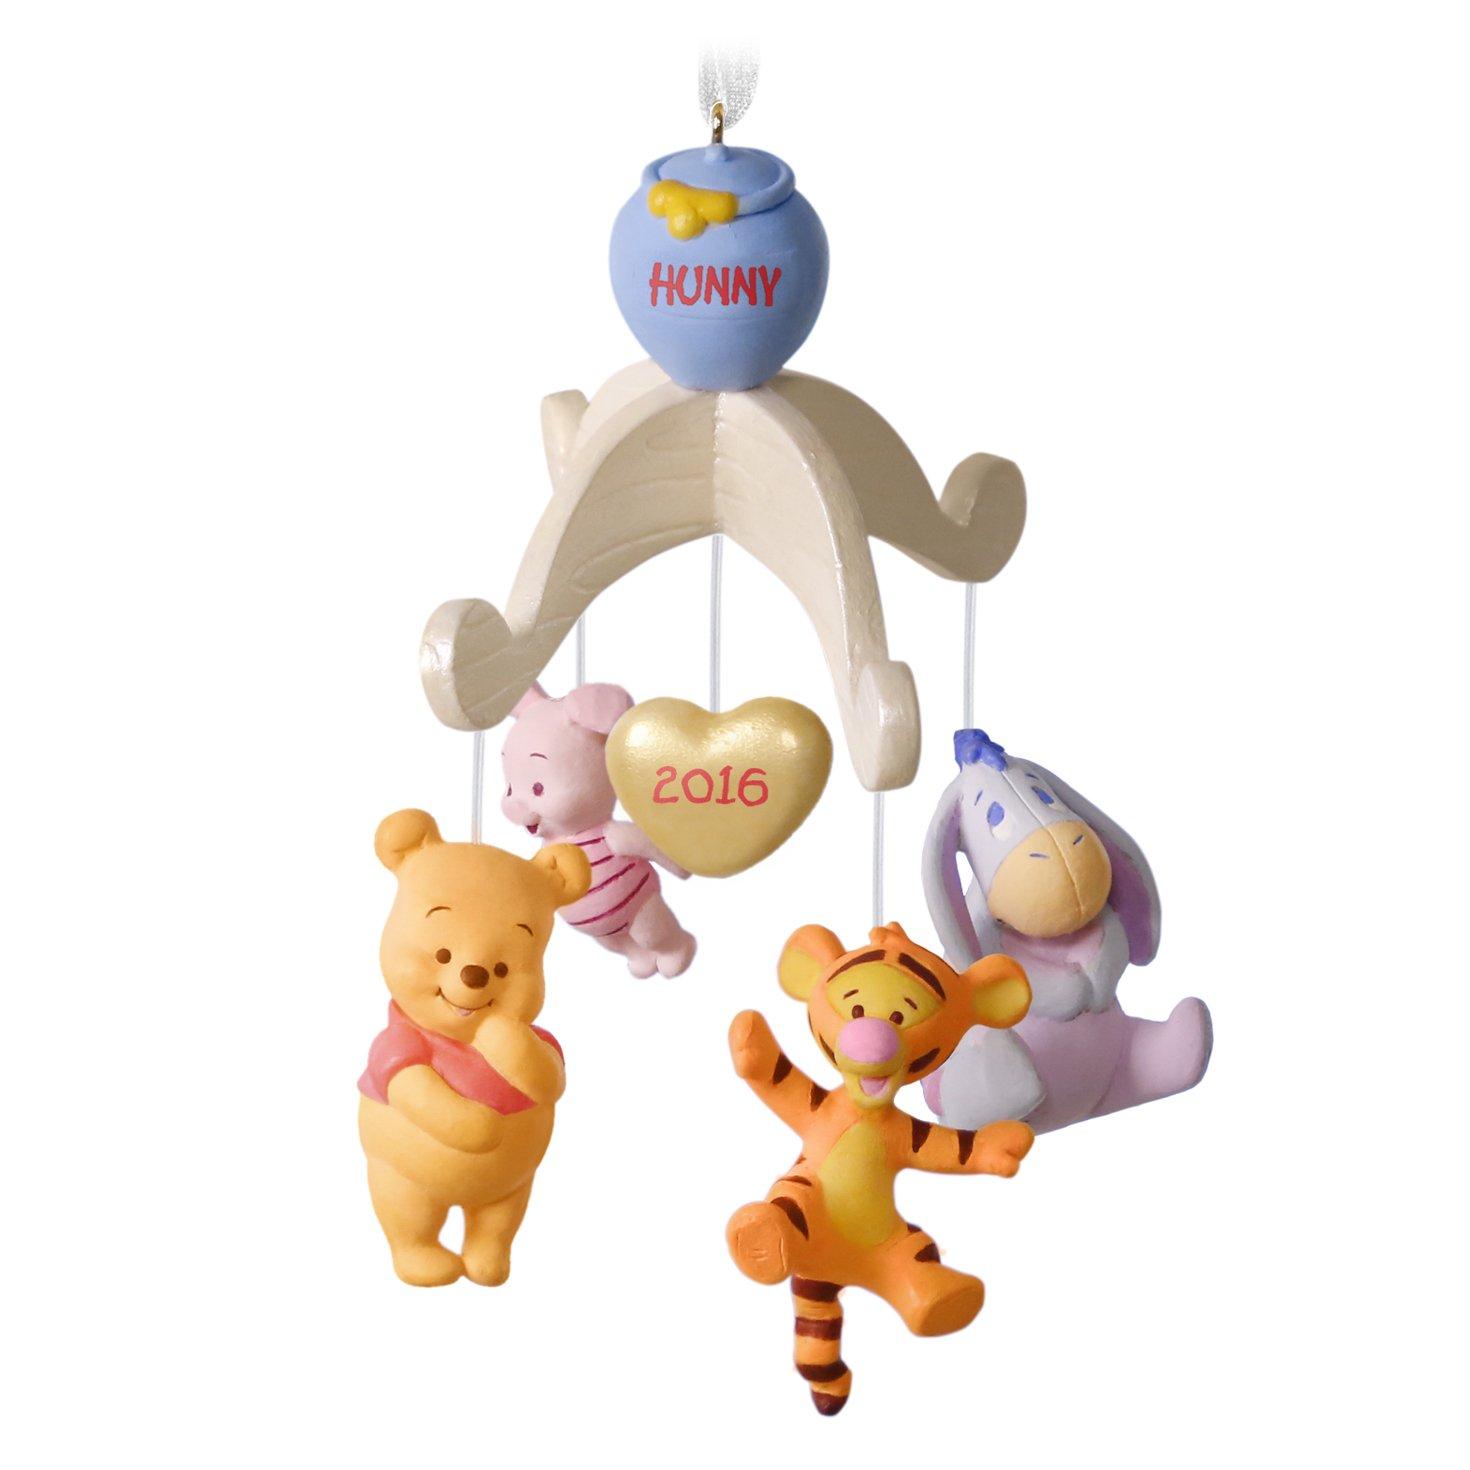 Hallmark Keepsake Babys First 2016 Winnie the Pooh Dated Holiday Ornament